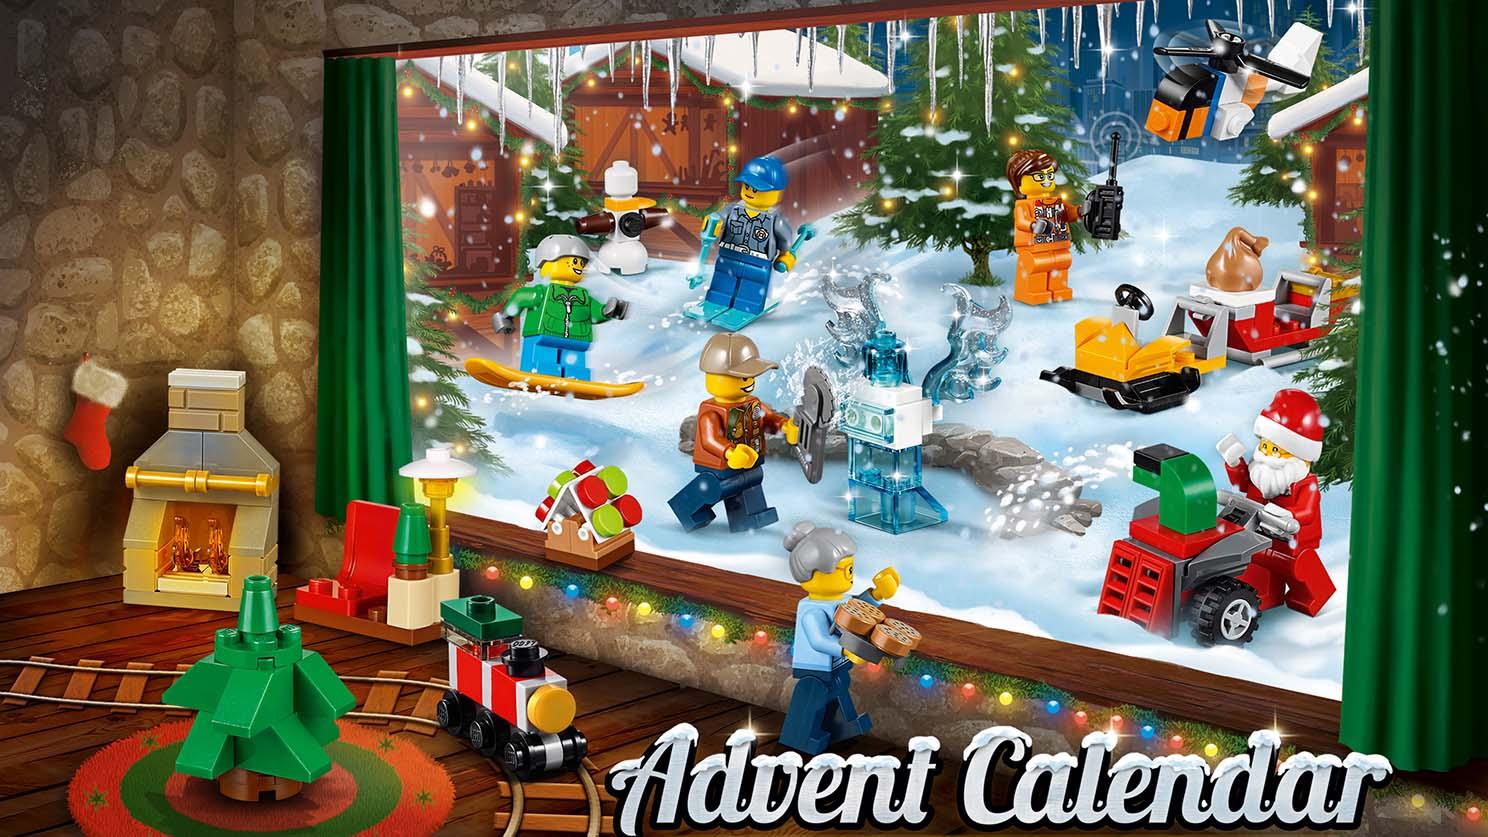 Calendrier Lego City.60155 Le Calendrier De L Avent City Wiki Lego Fandom